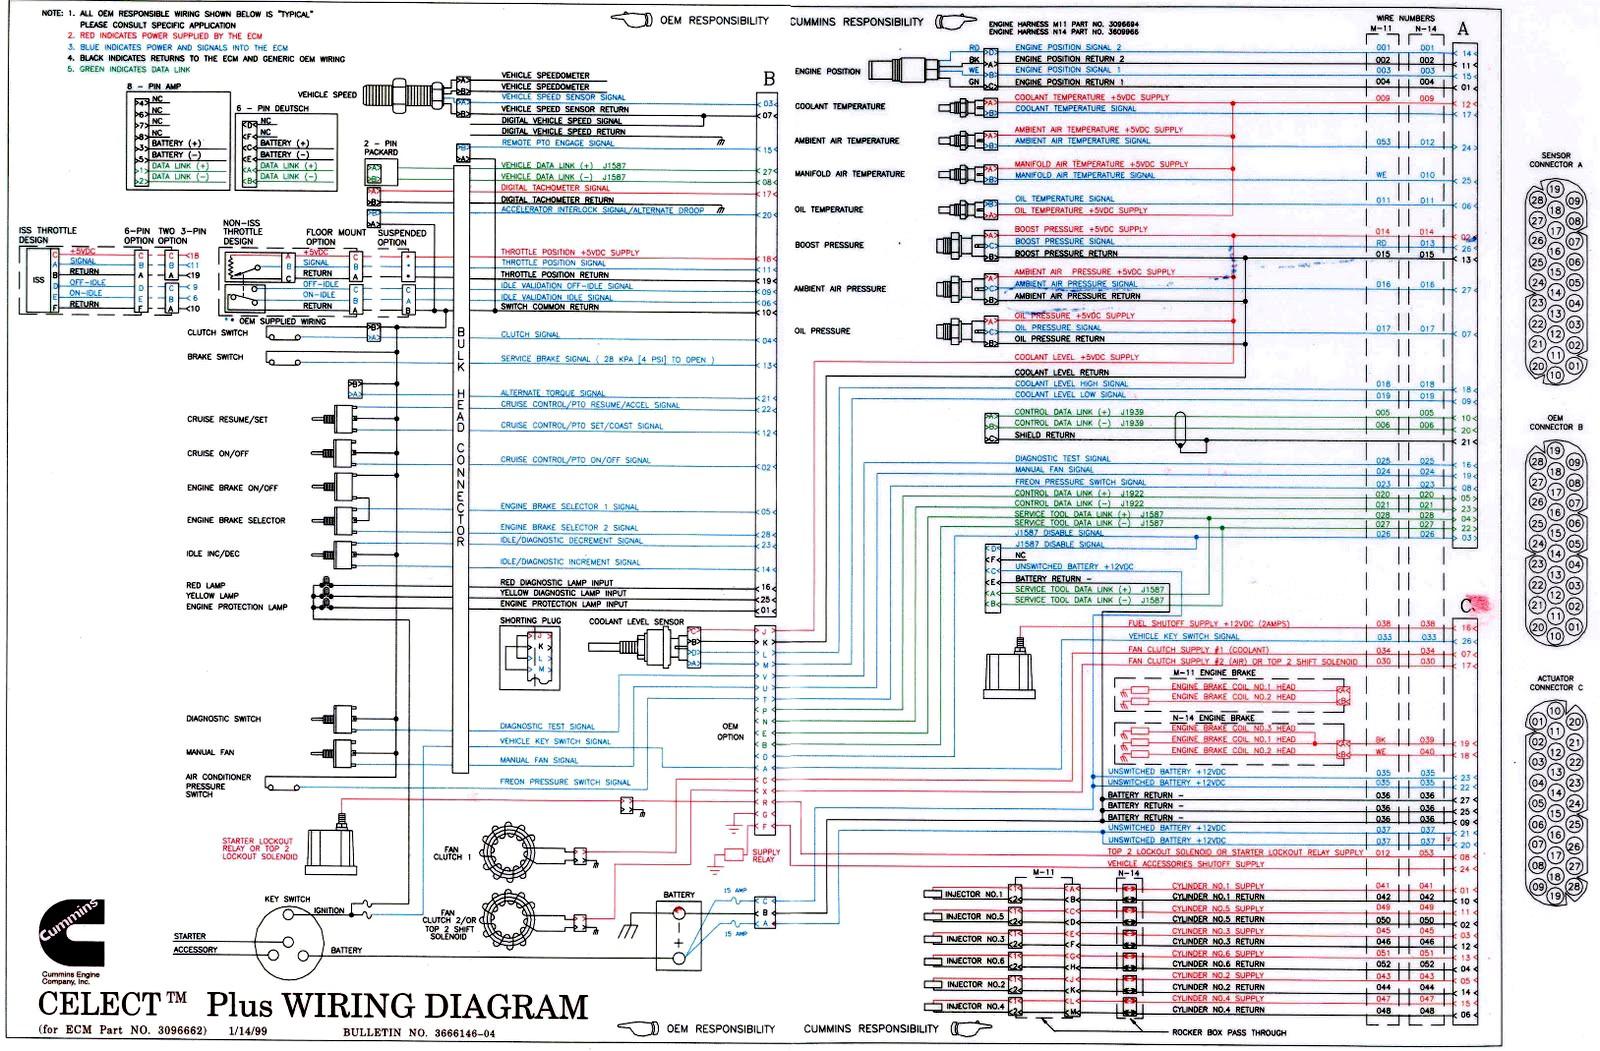 medium resolution of m11 wiring diagram wiring diagram portal basic electrical schematic diagrams m11 wiring diagram